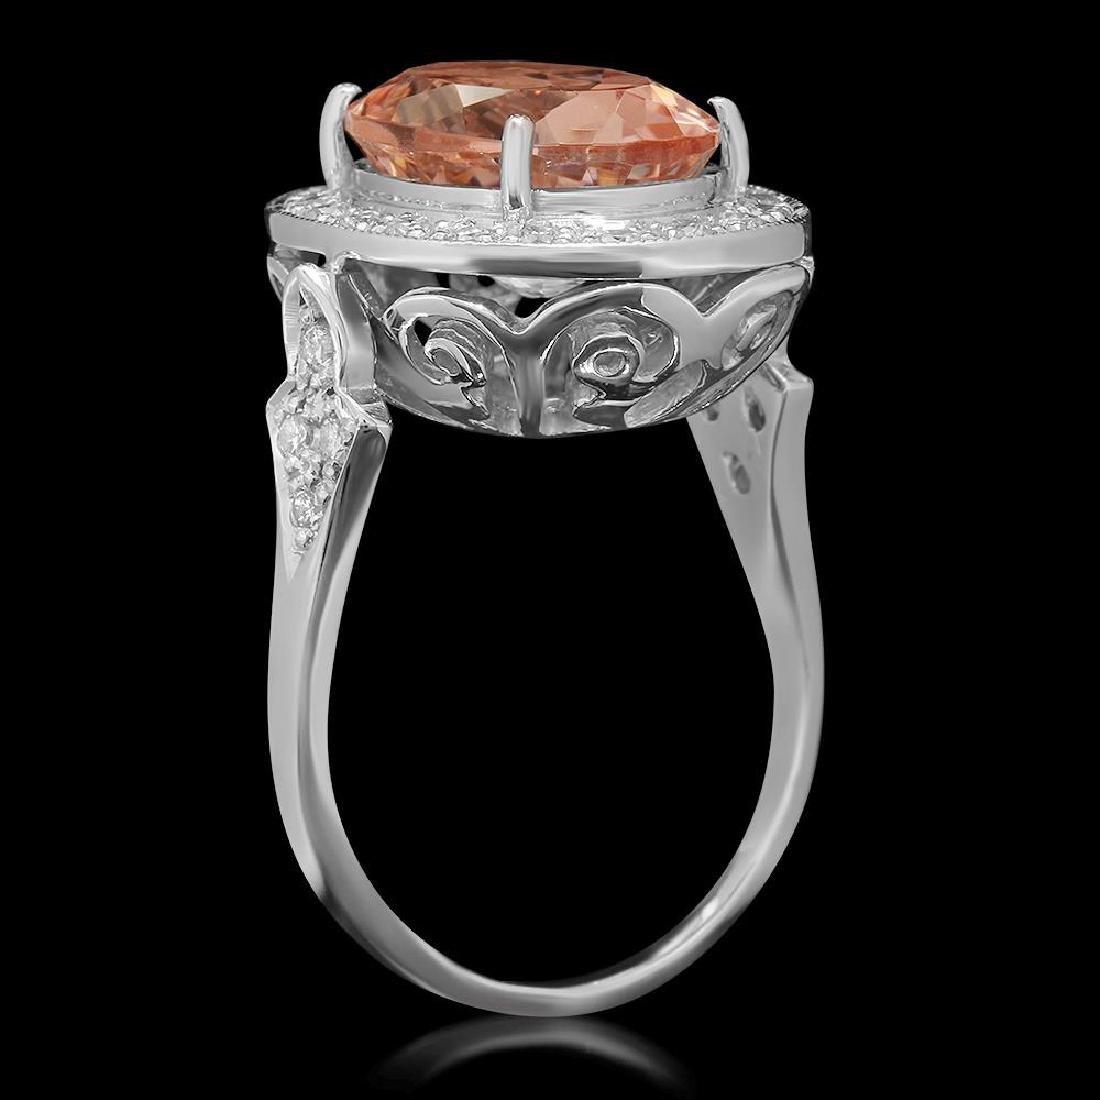 14K Gold 5.97ct Morganite 0.52ct Diamond Ring - 2